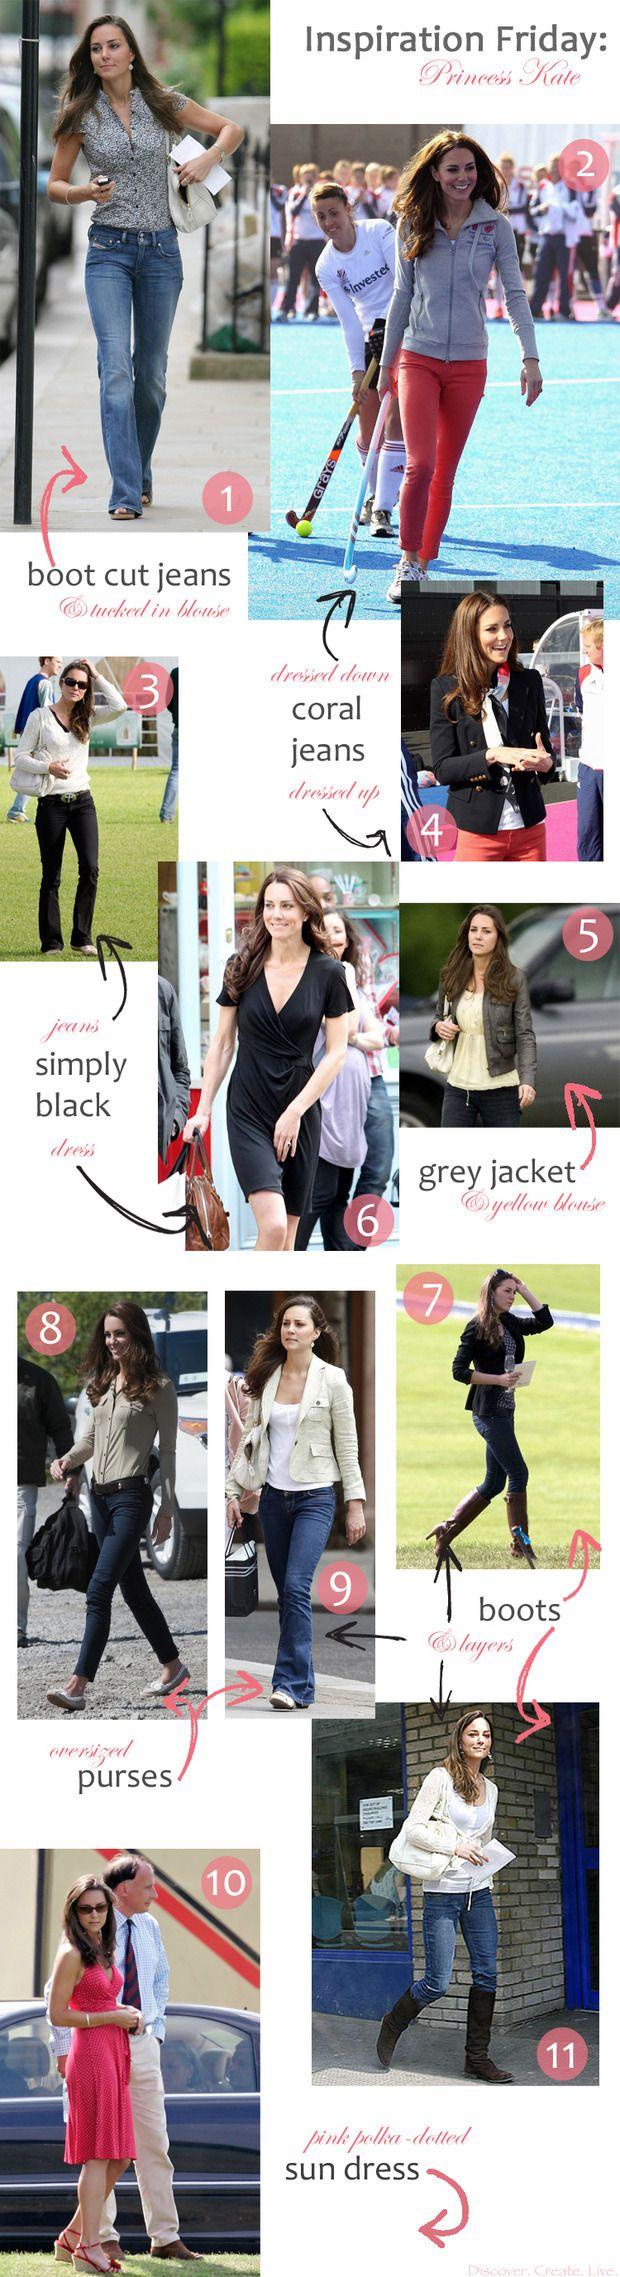 best my fashion inspiration images on pinterest fashion